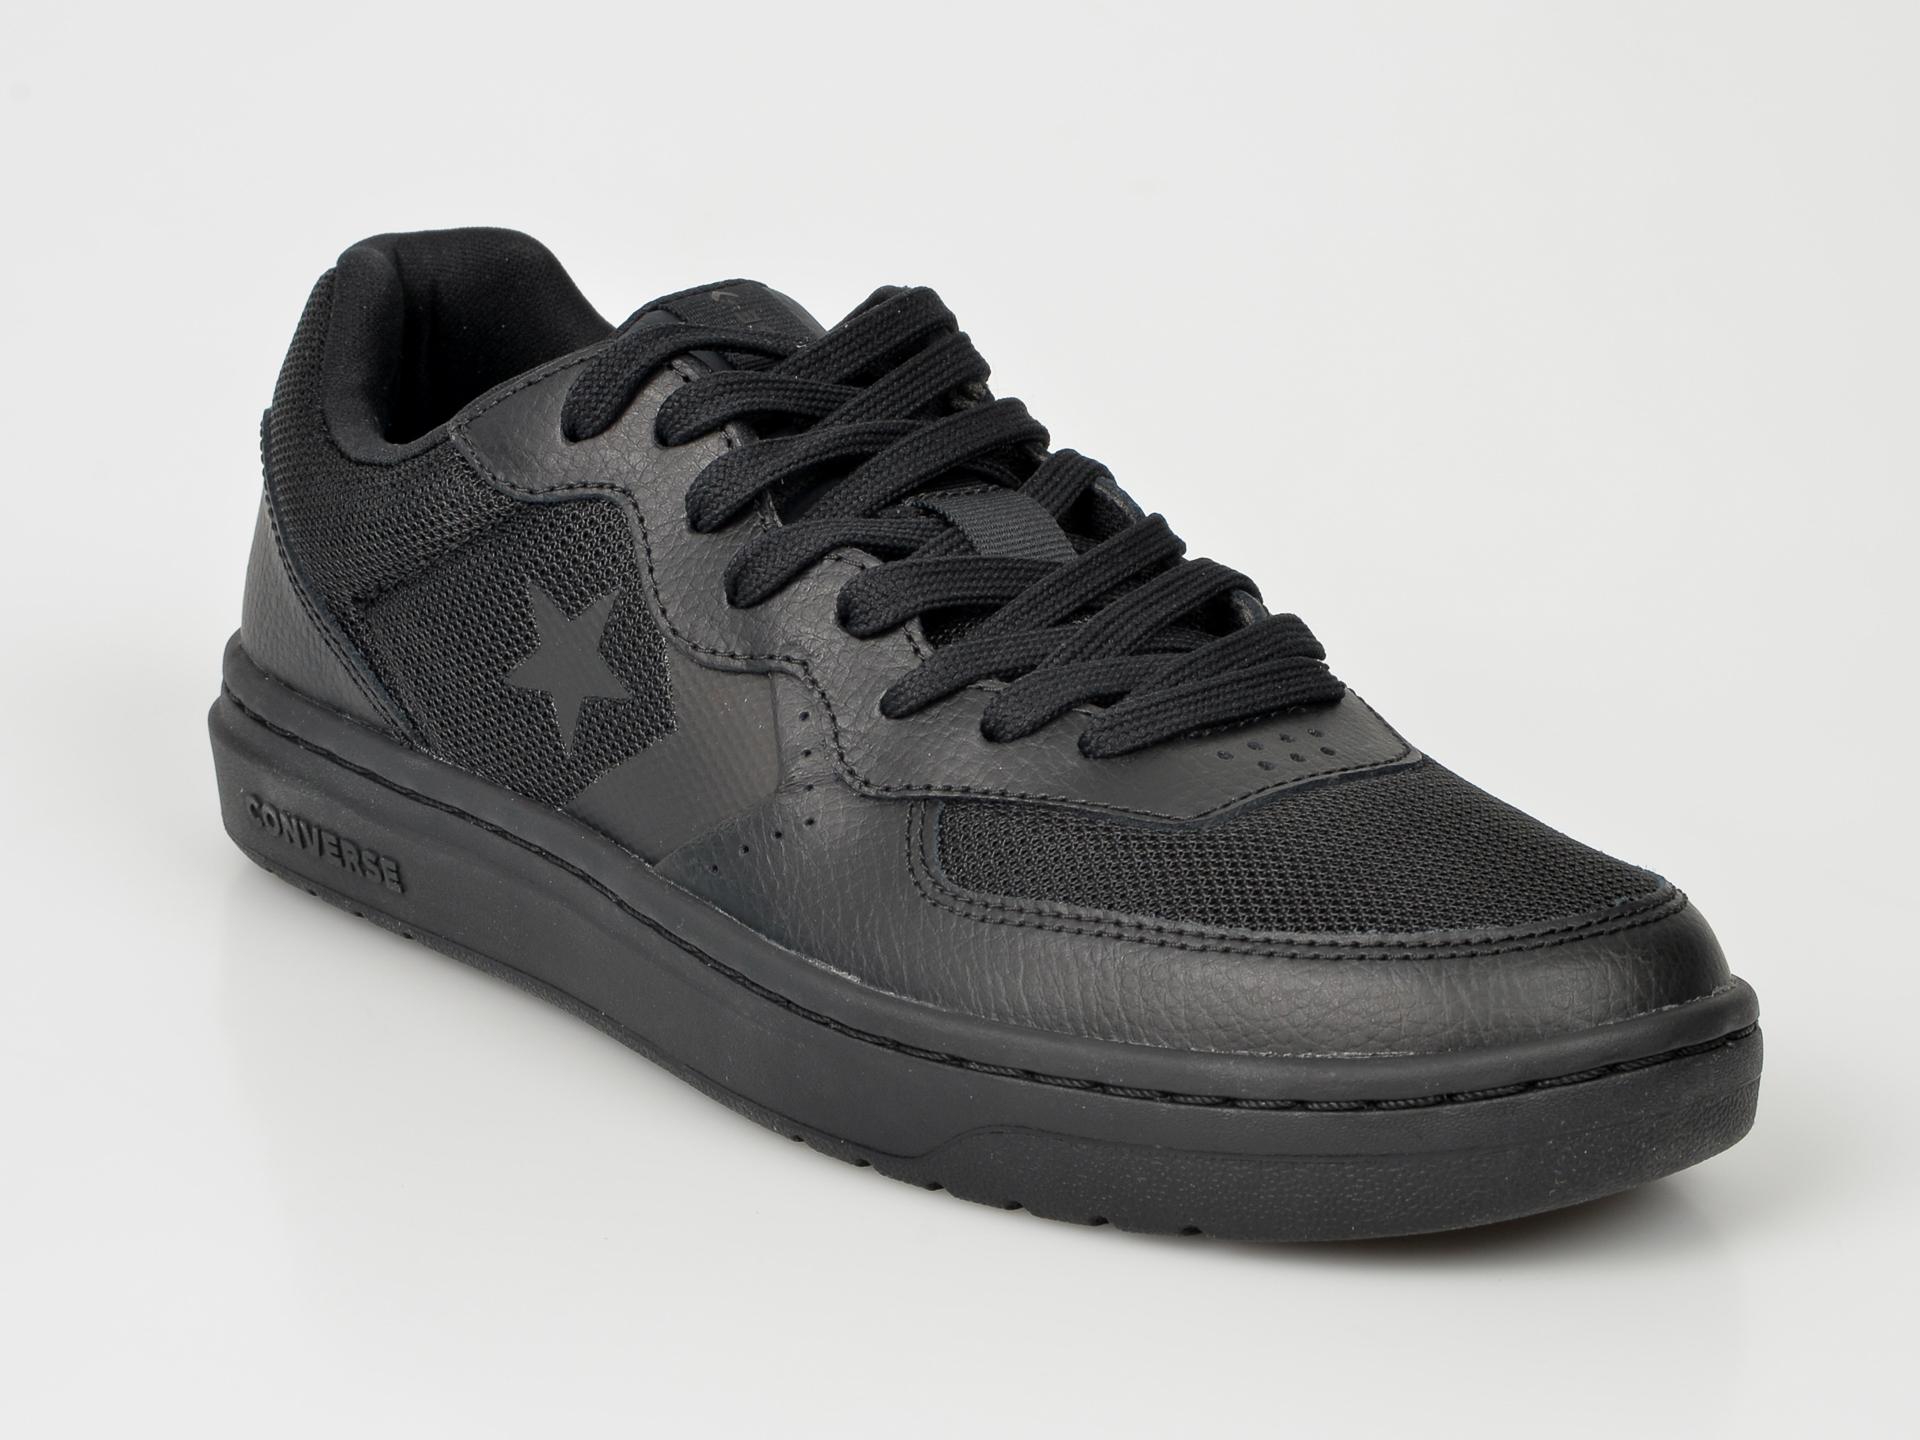 Pantofi Sport Converse Negri, 1, Din Canvas